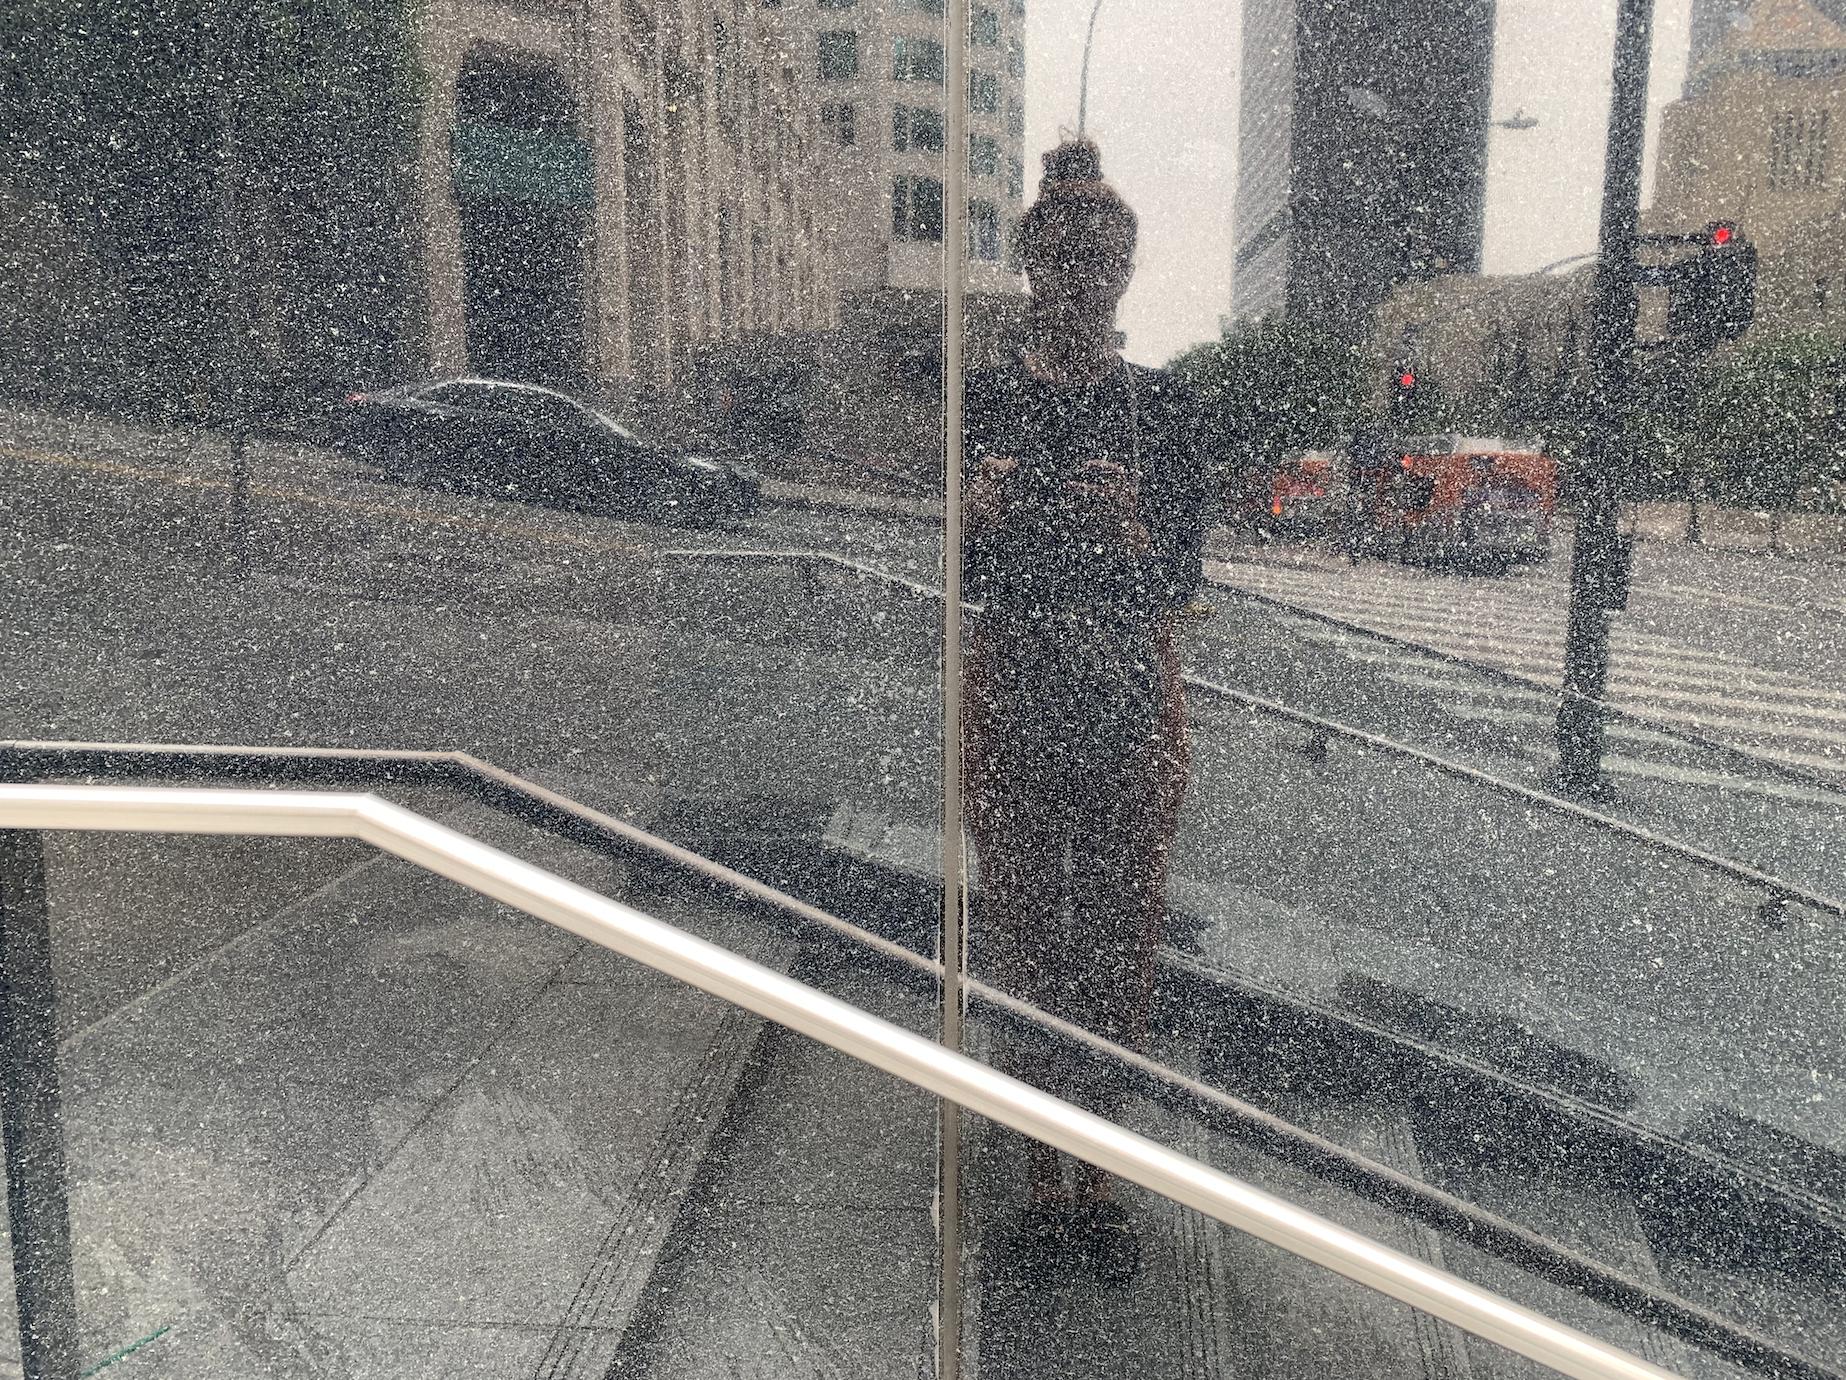 Los Angeles, 2019.